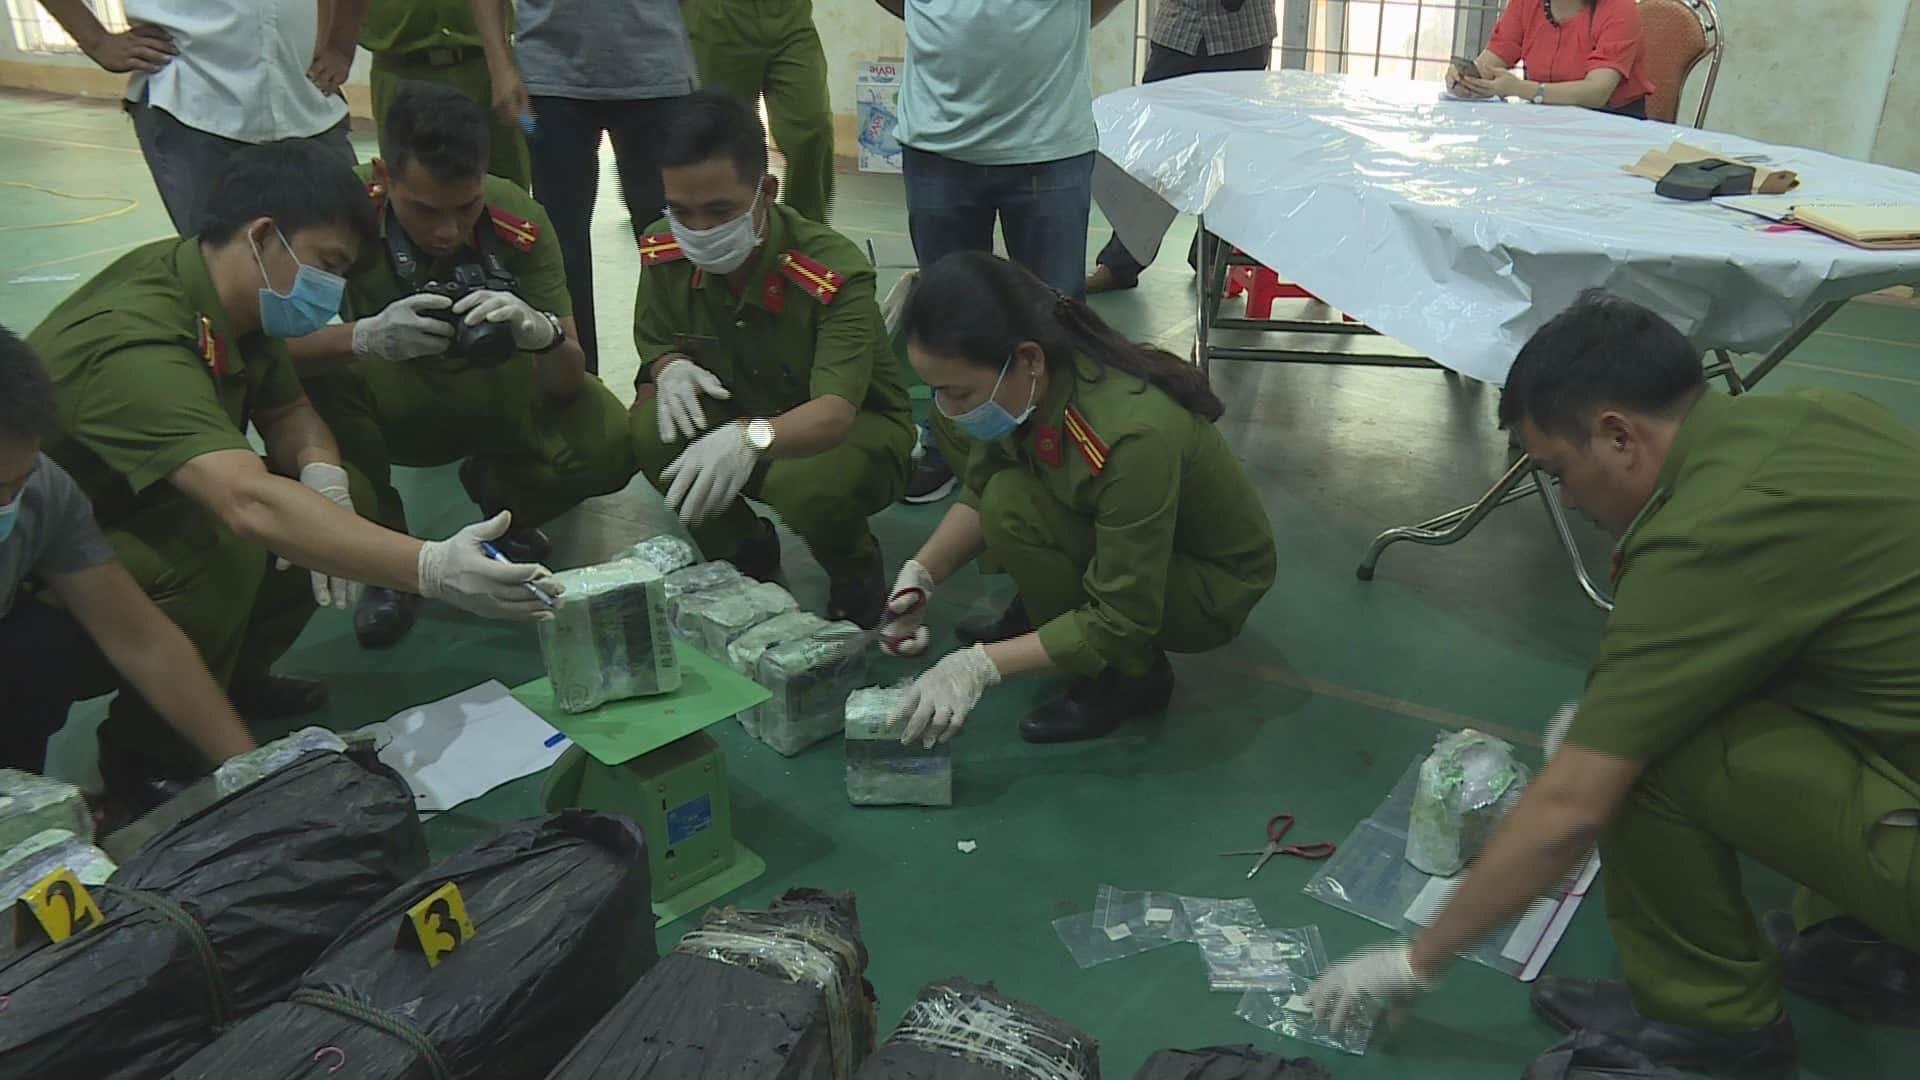 Two arrested for trafficking 200kg of crystal meth in Vietnam's Central Highlands